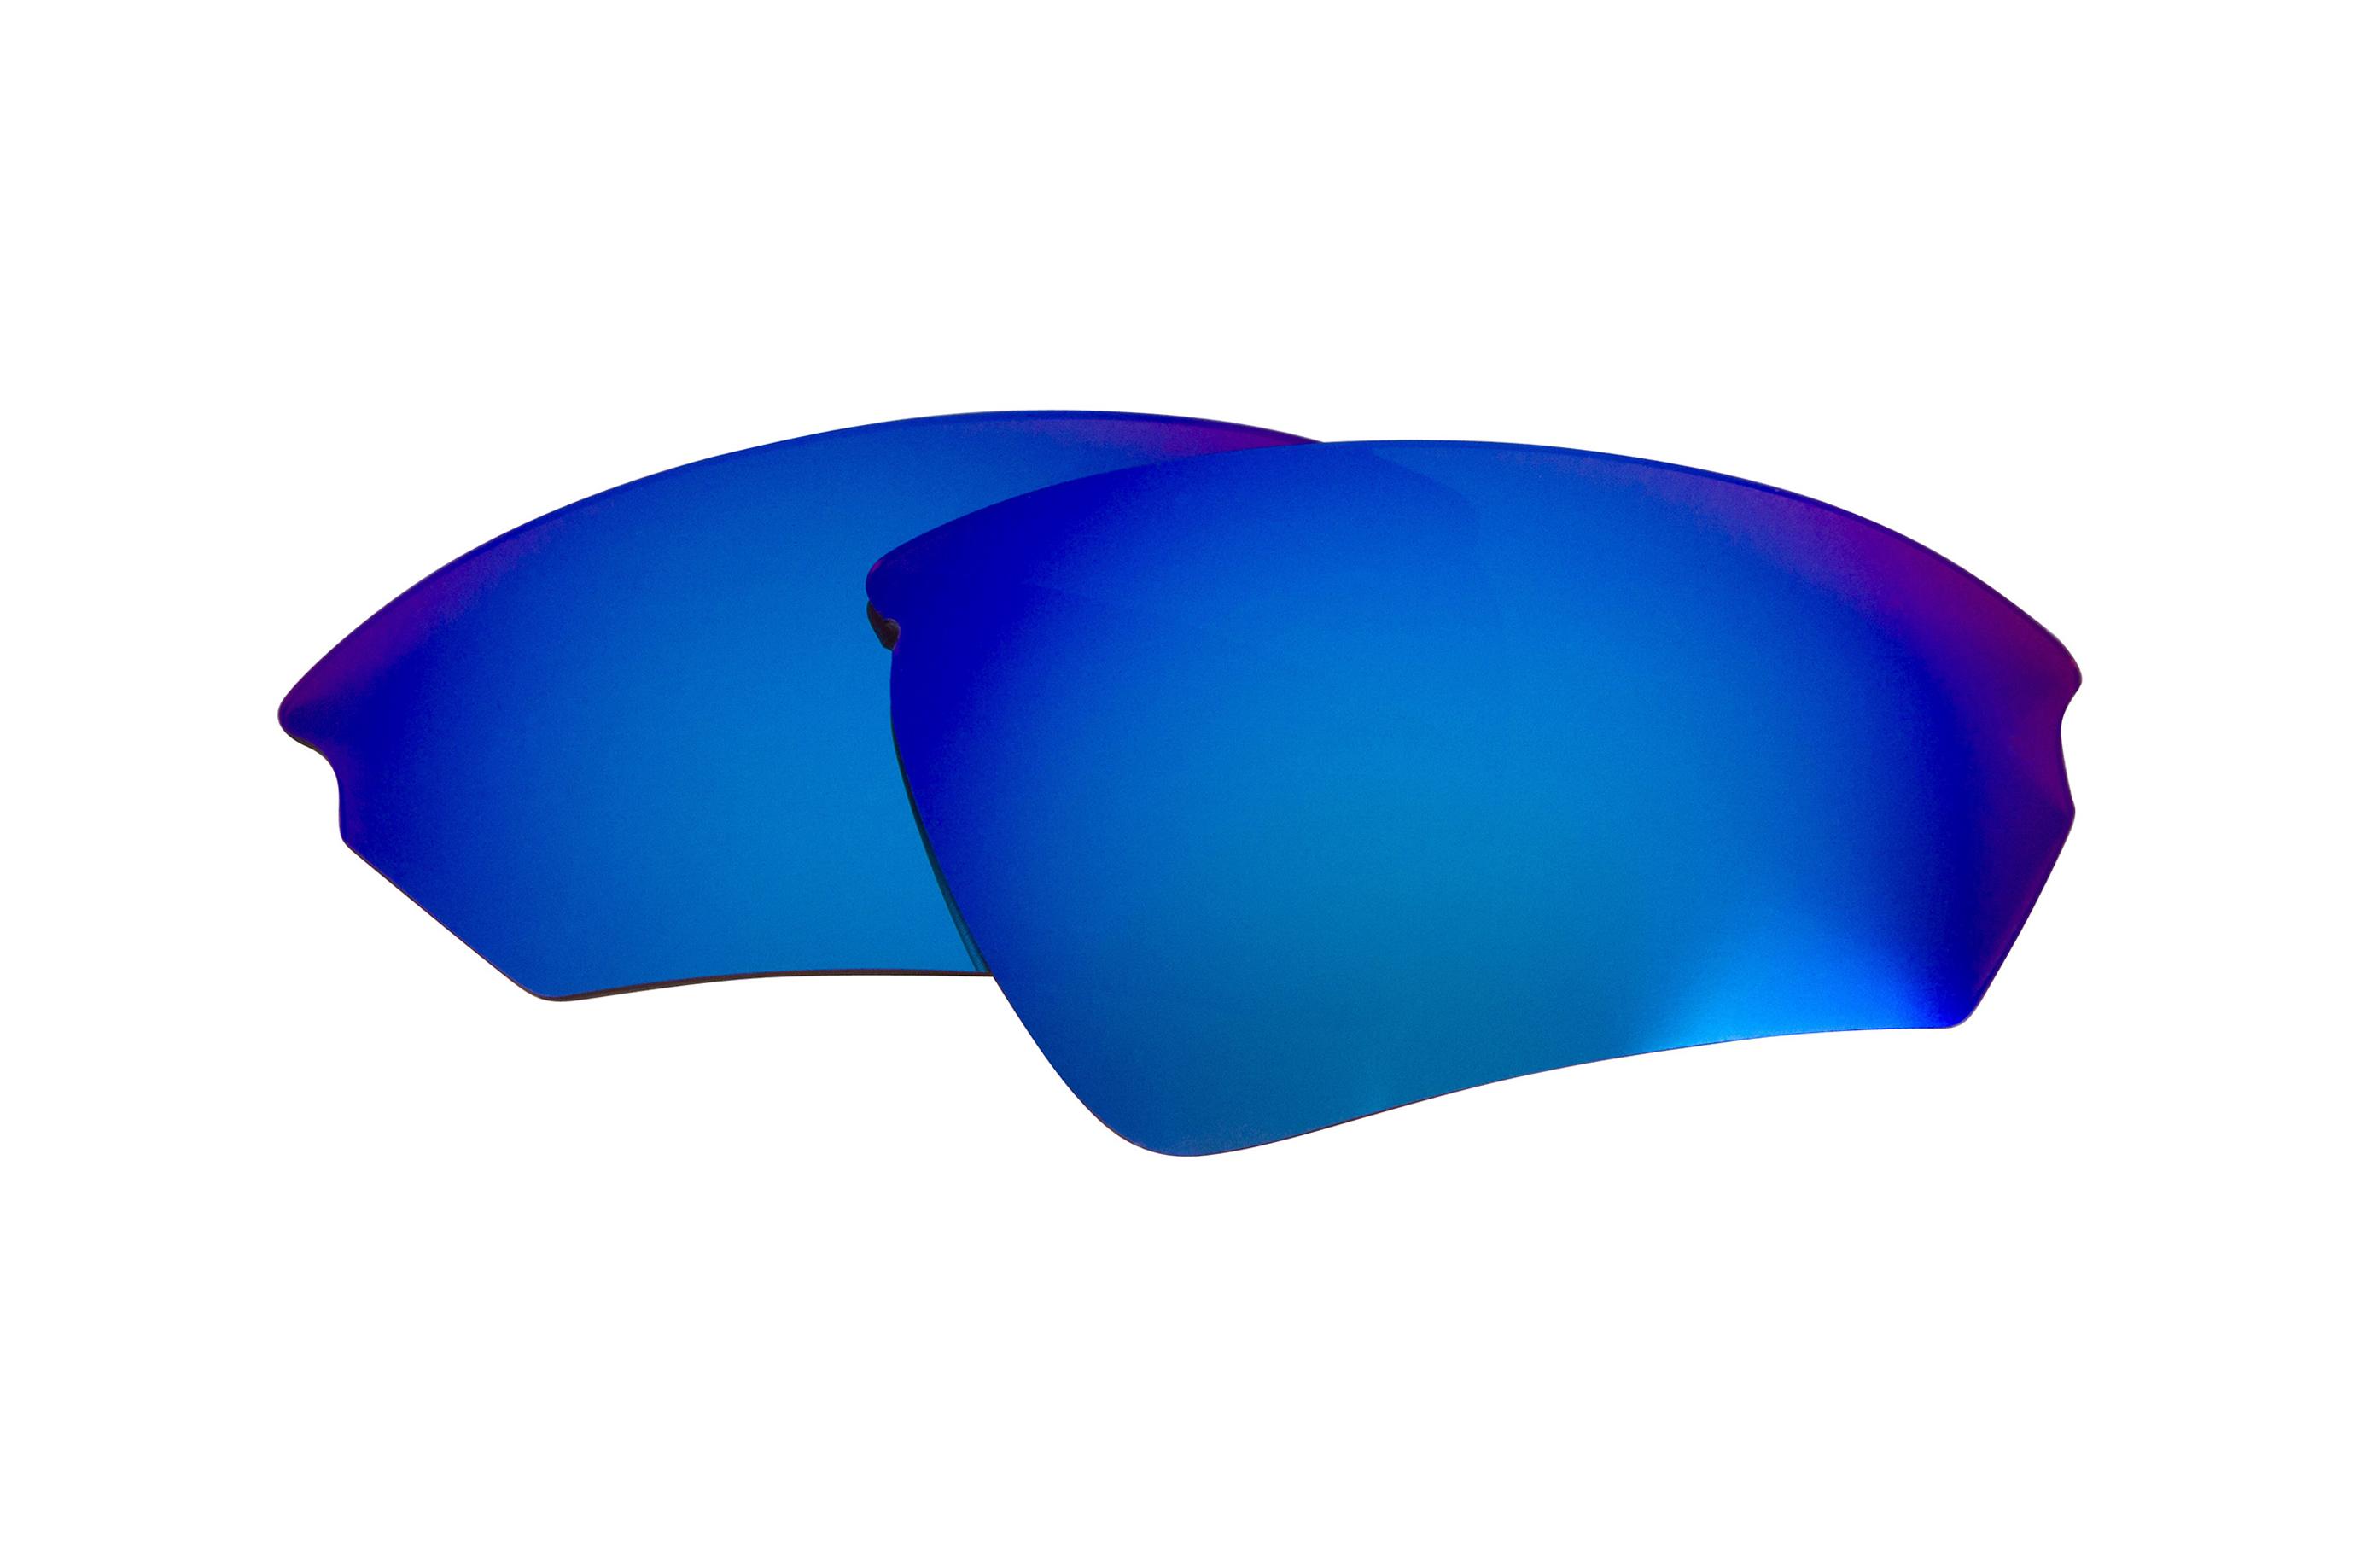 aafa72fec46 Rudy Project Noyz - Ice Blue Mirror Polarized - Seek Optics